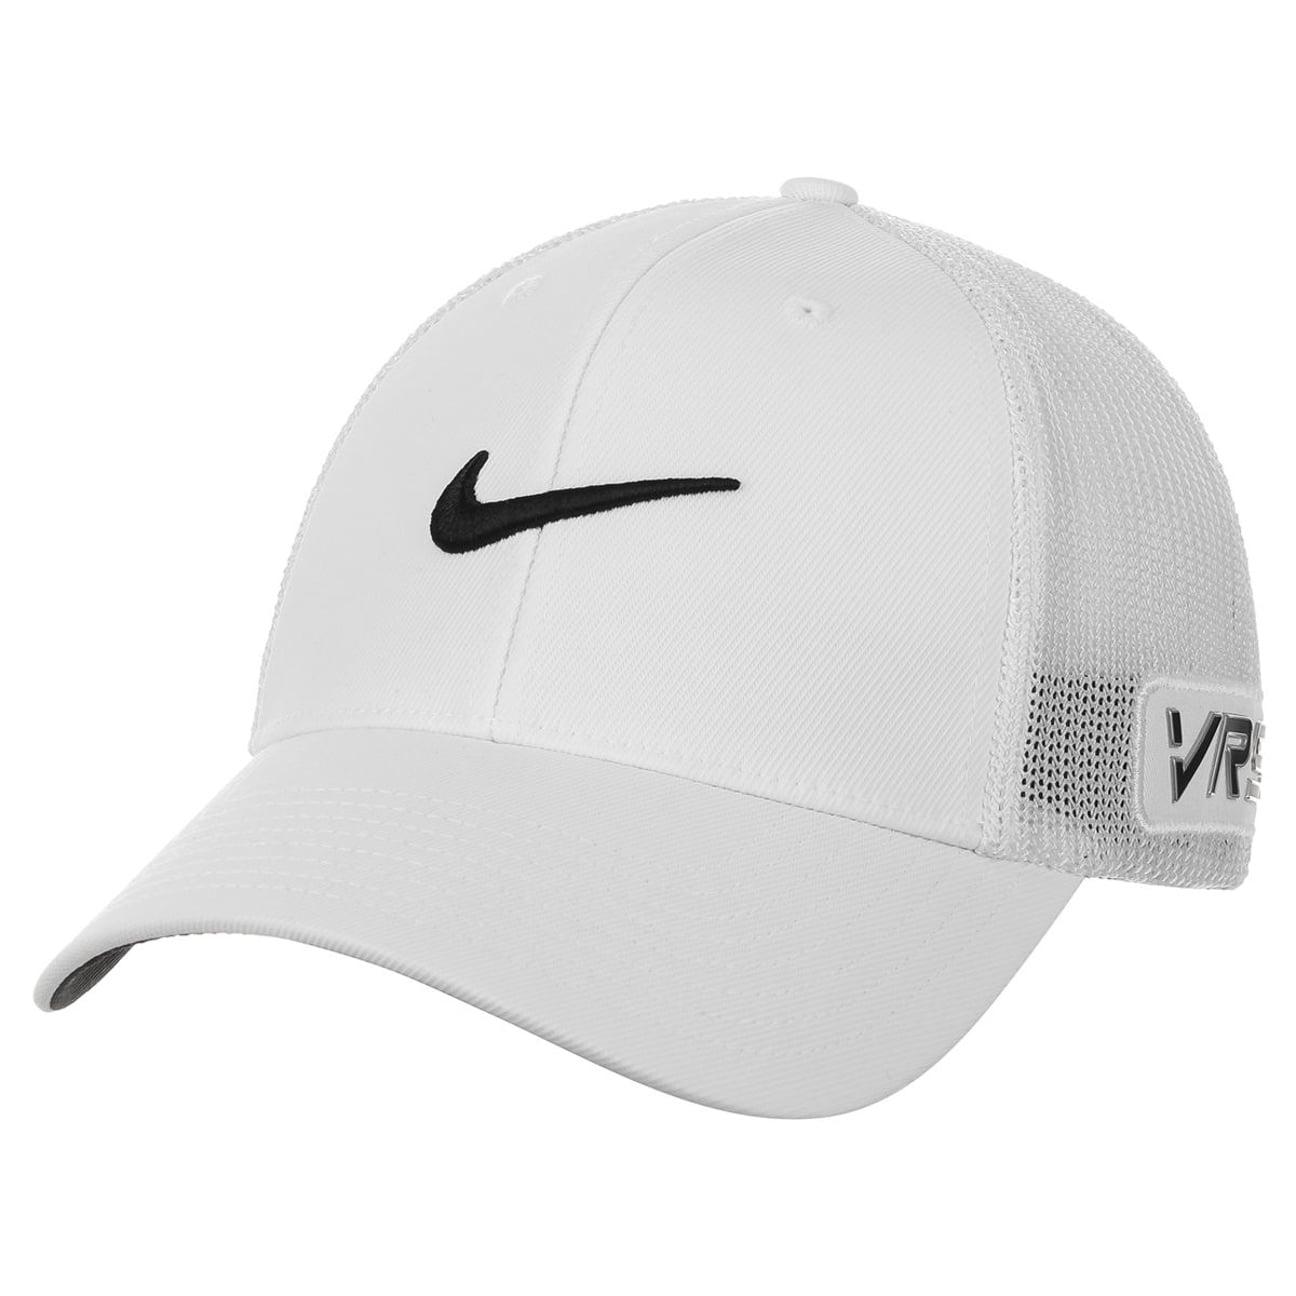 1a1c51894e0728 ... New Tour Flexfit Cap New Logo by Nike - coral 1 ...